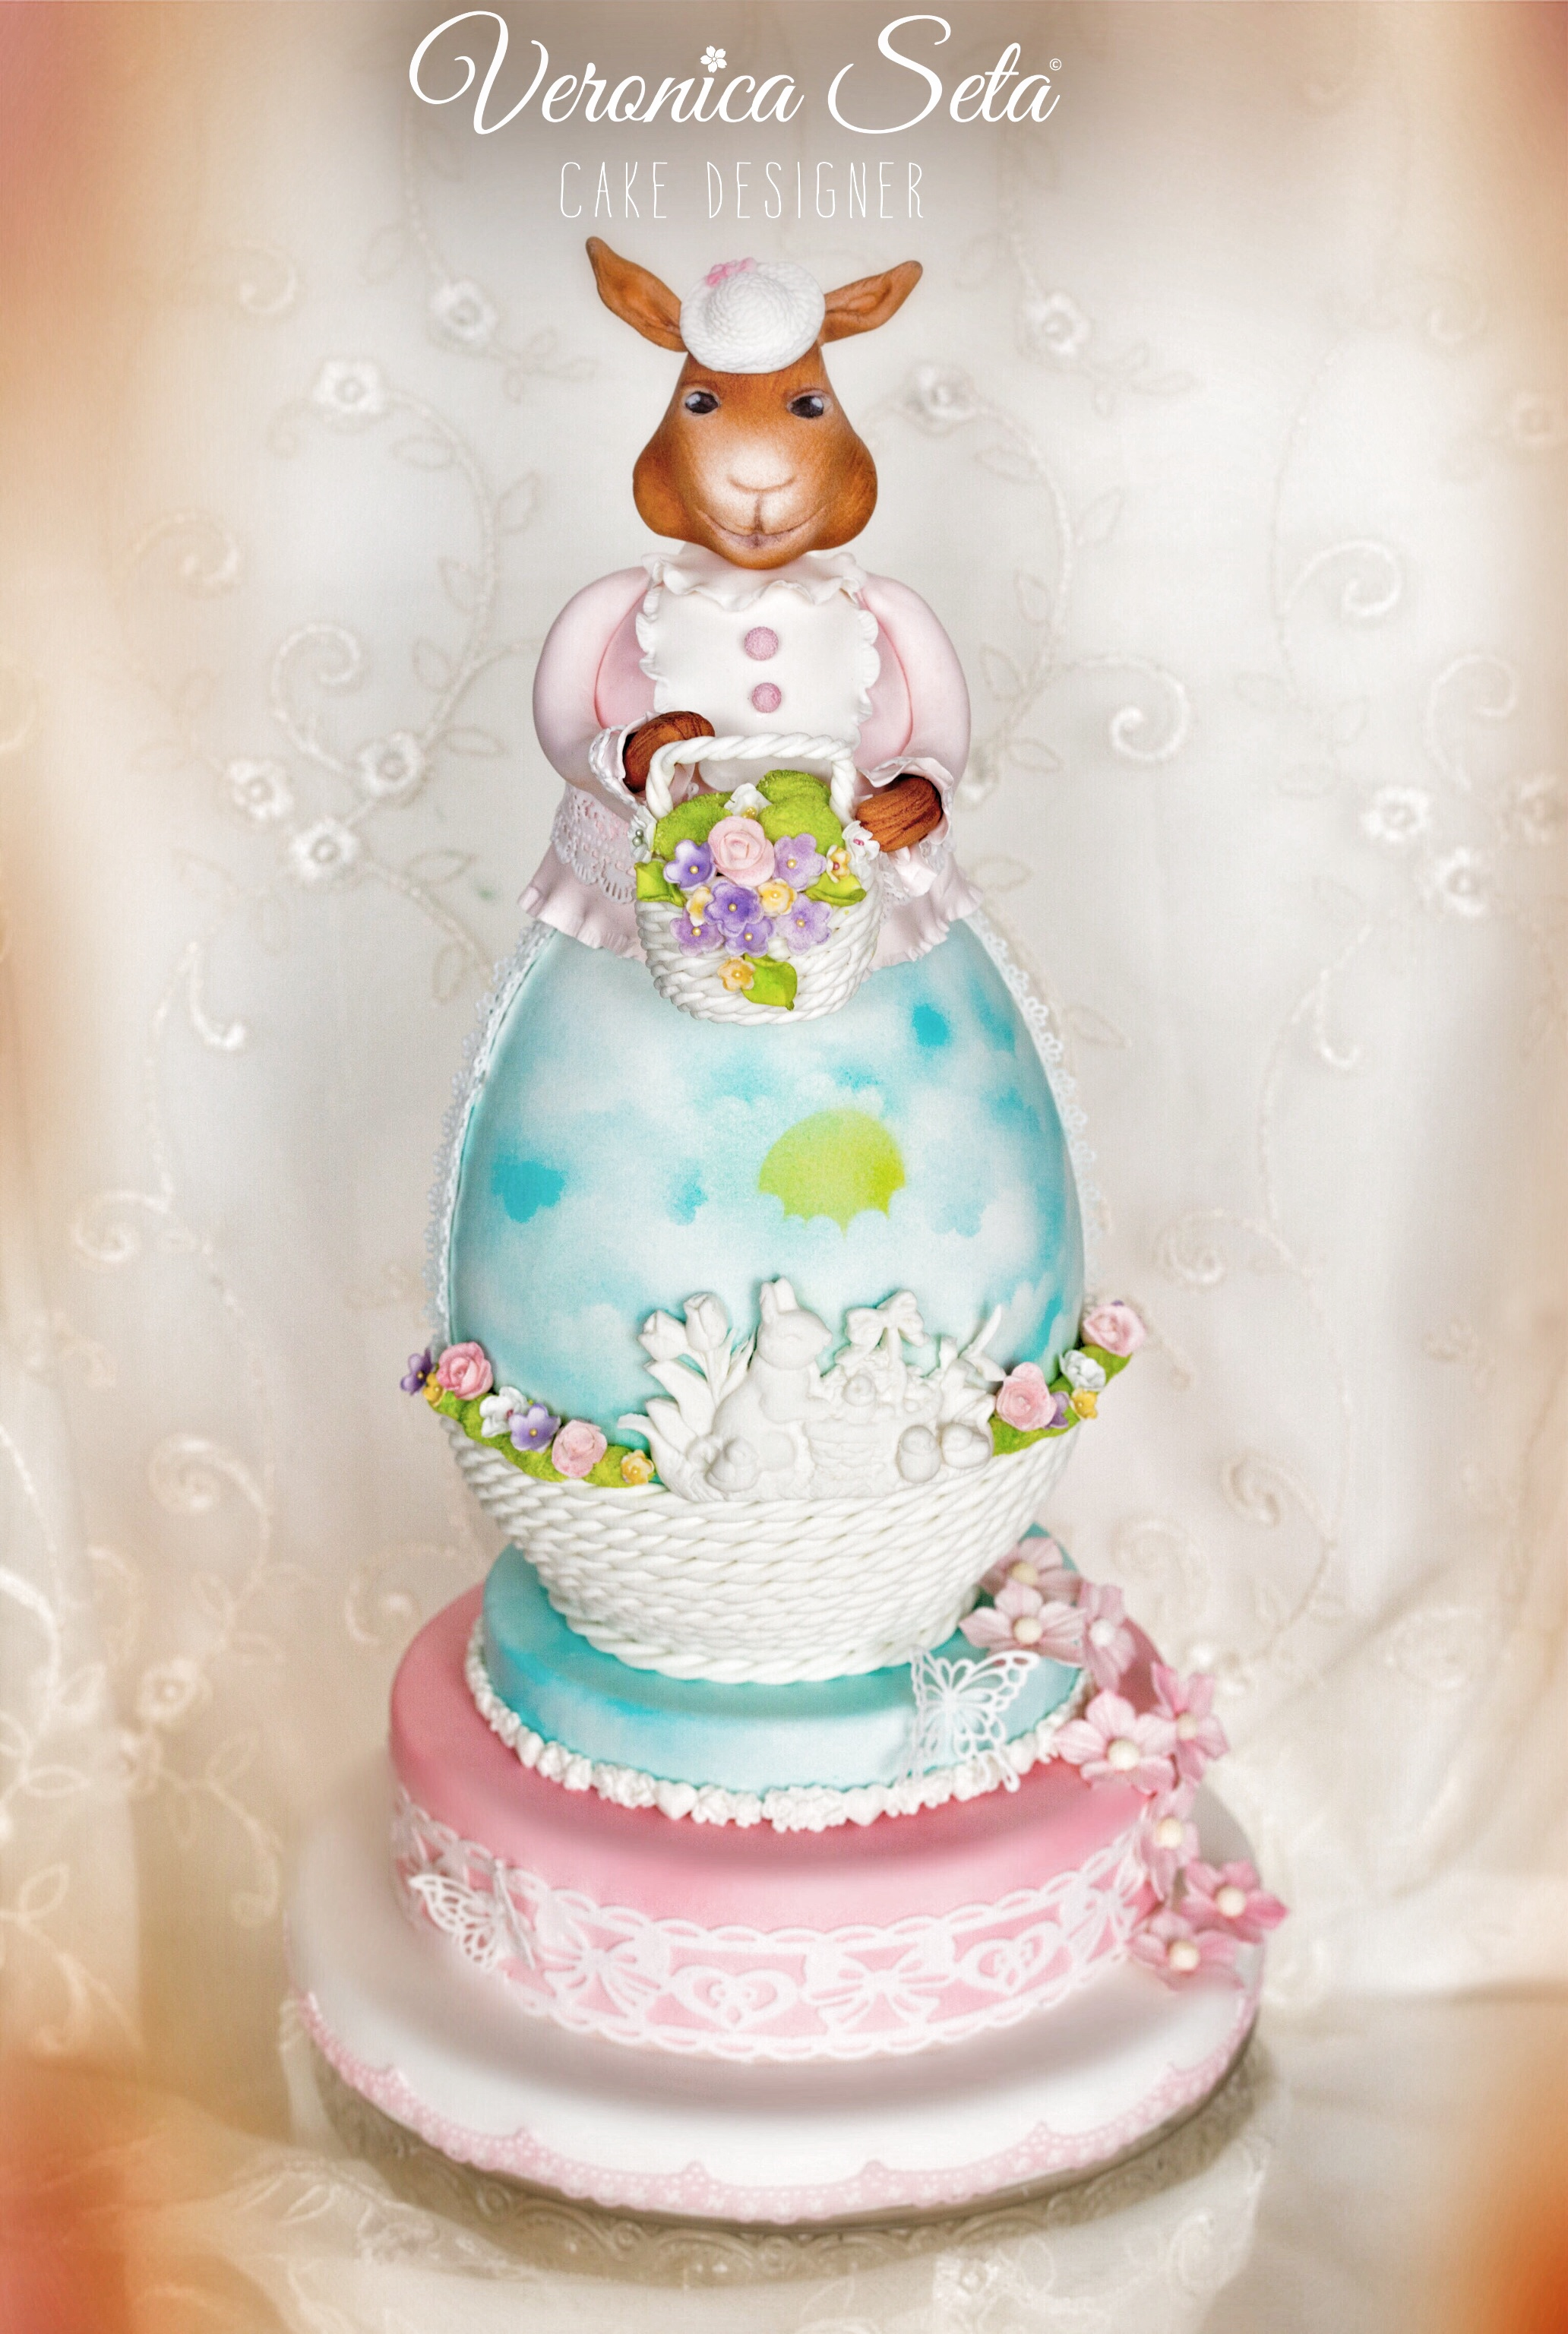 Veronica-Seta-Tutorial-Mrs-Rabbit-hero.jpg#asset:17148